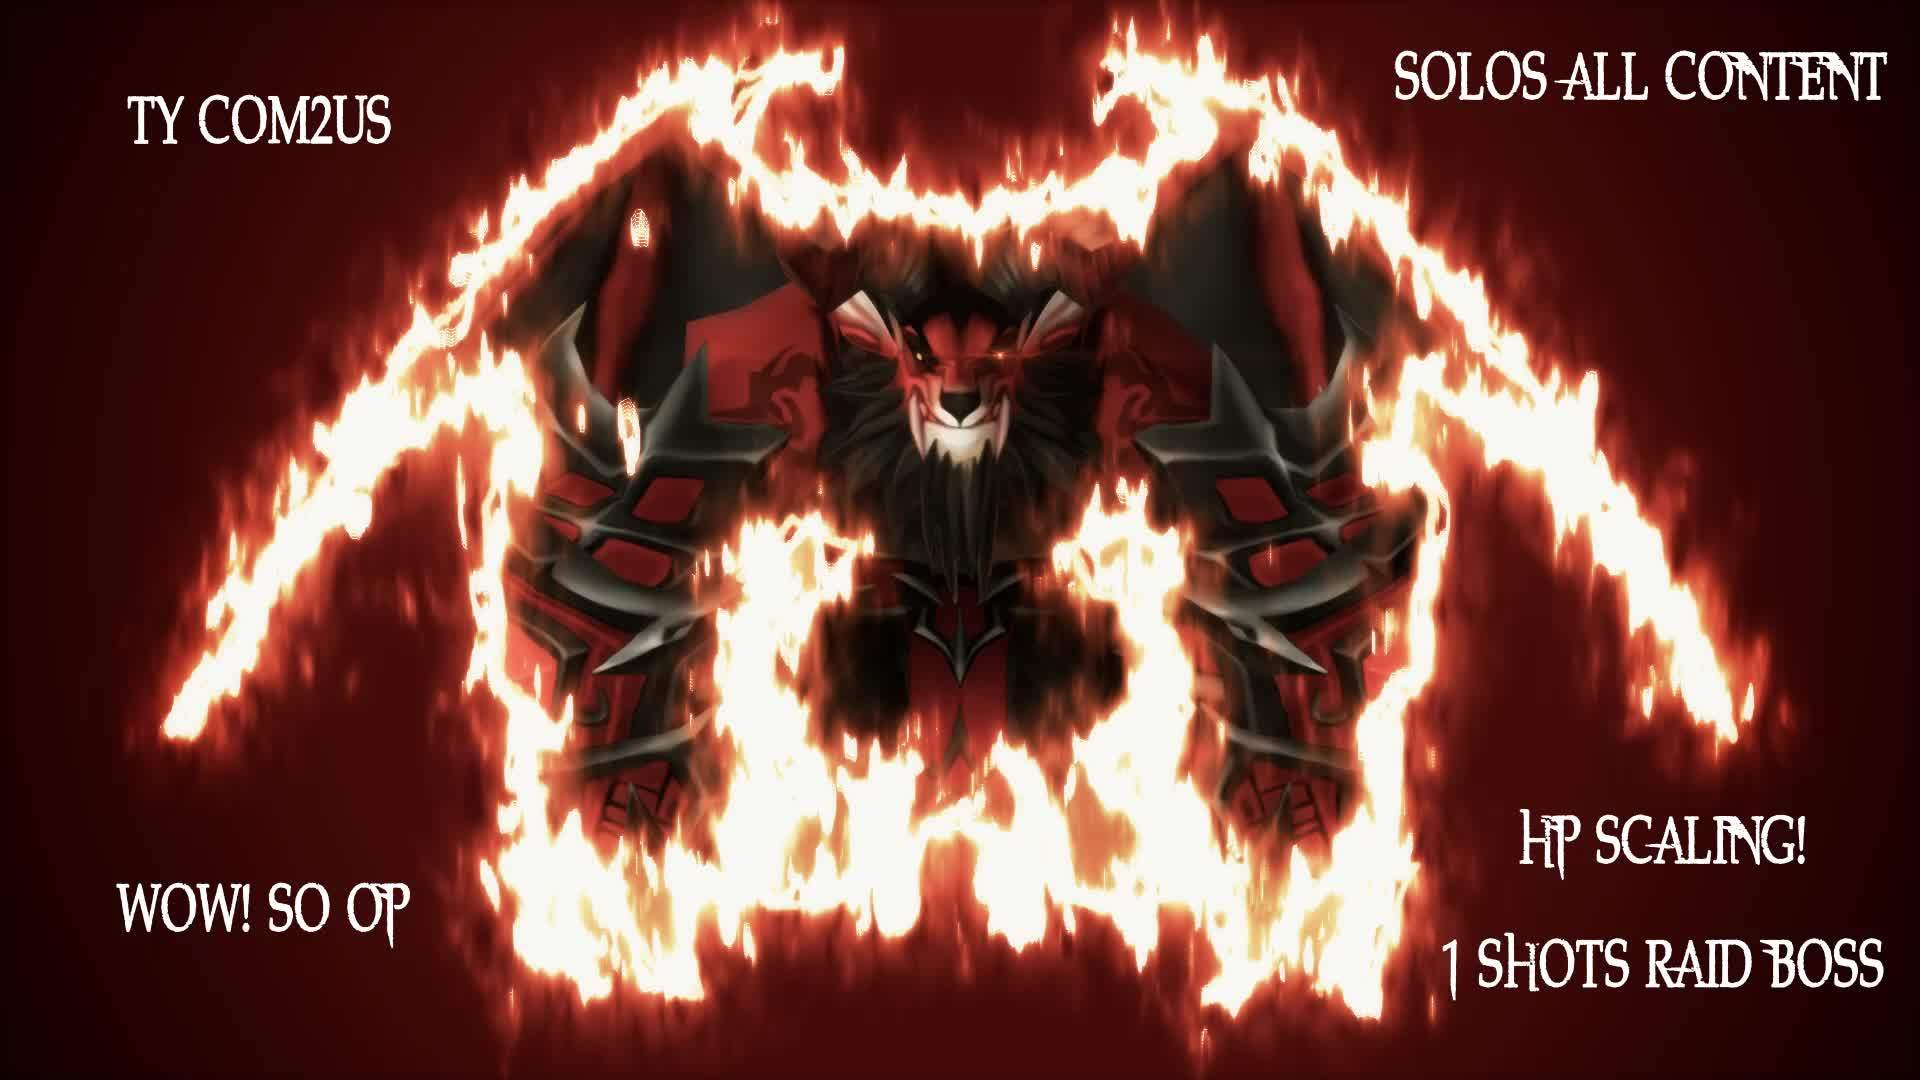 summonerswar, [Summoners War - 3D Render] Rakan Buffs! GIFs